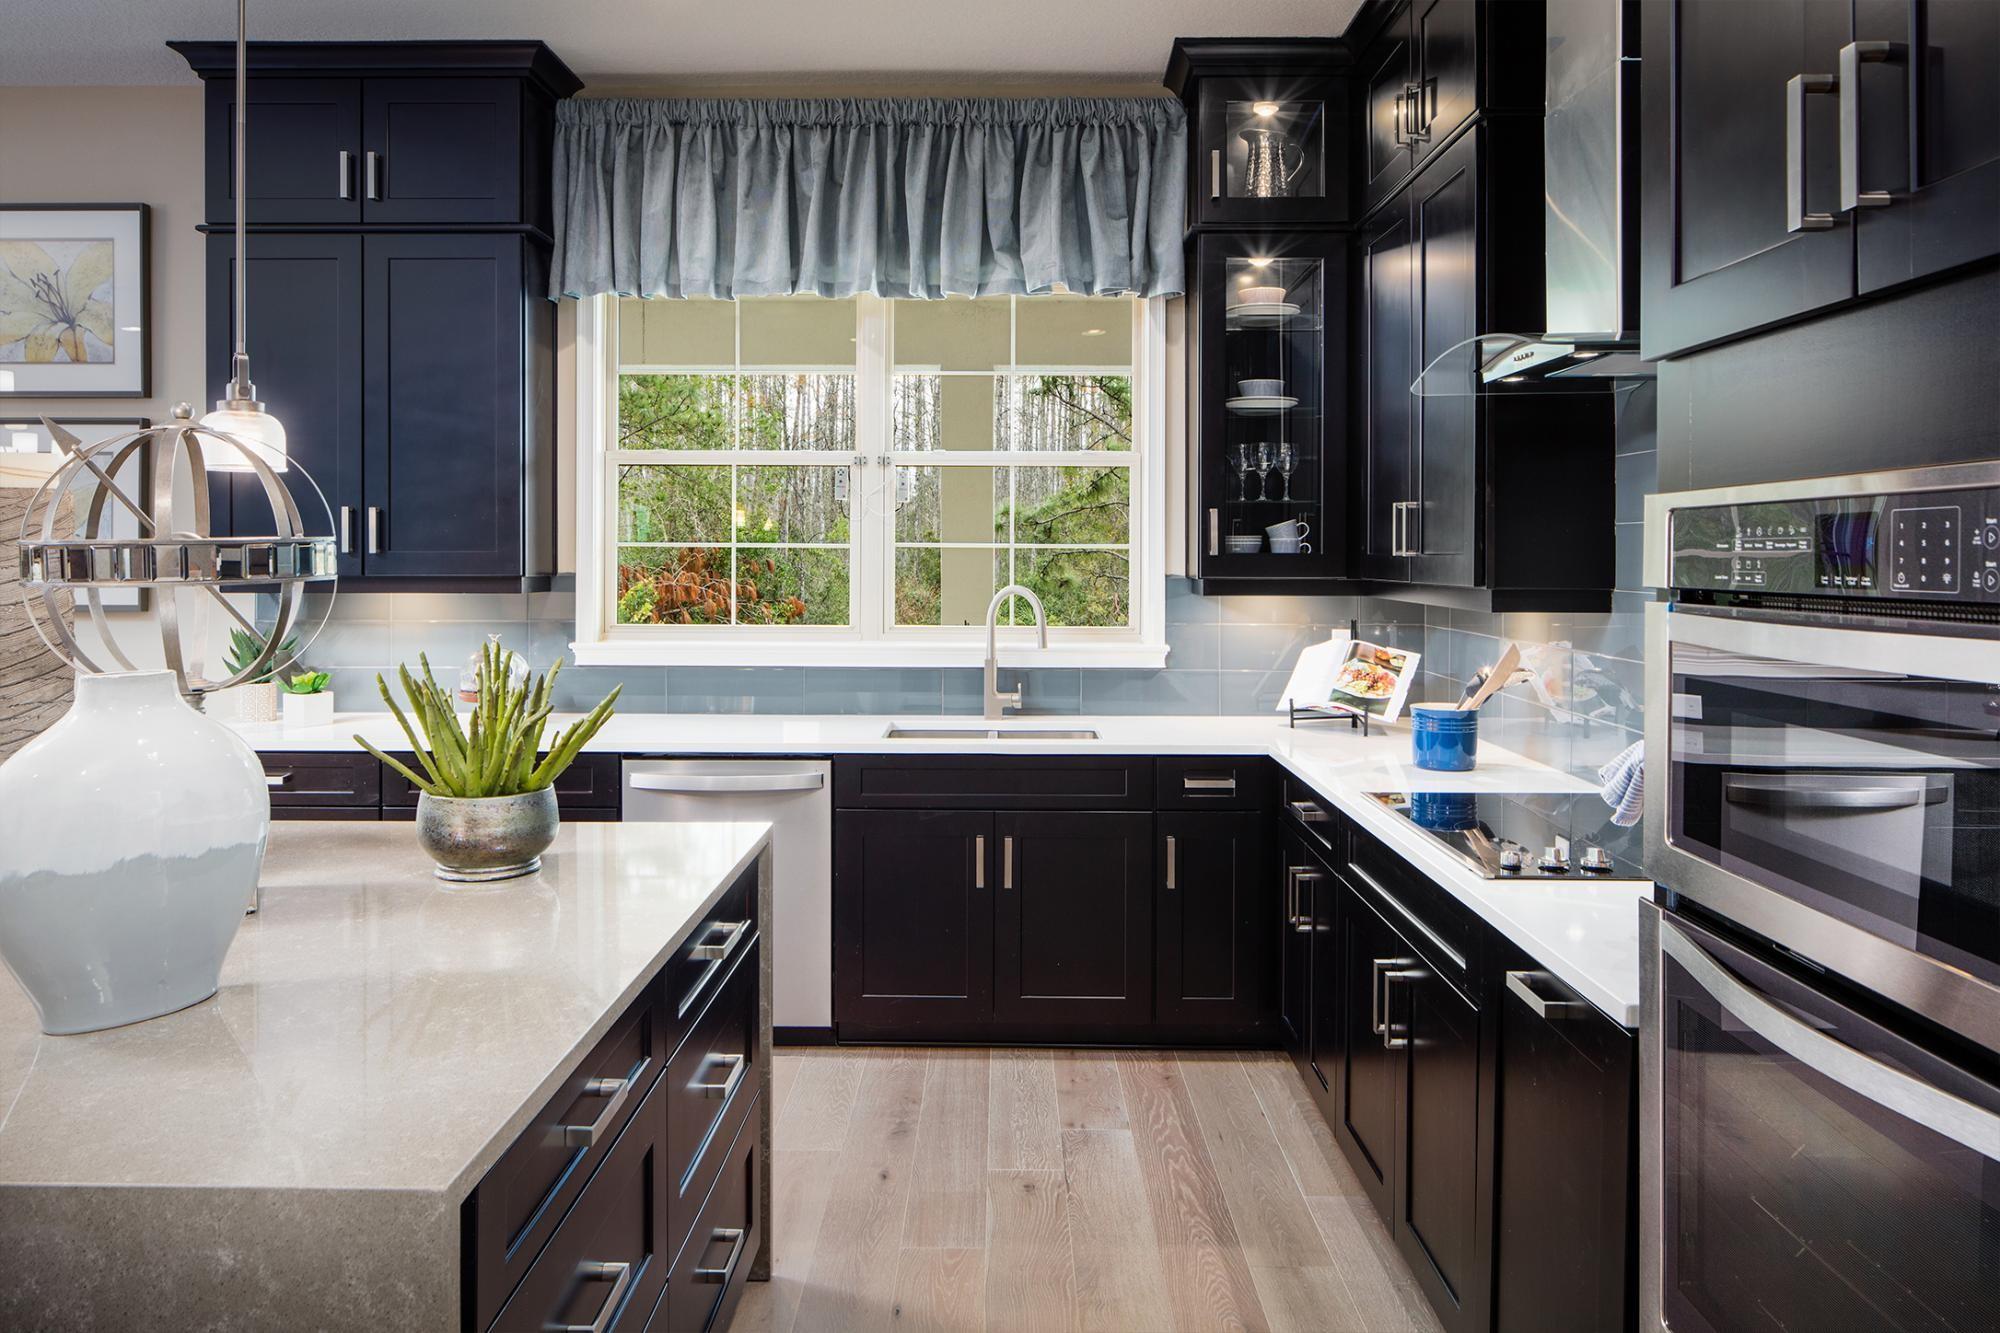 762196178082376_pinehurst-kitchen.jpg